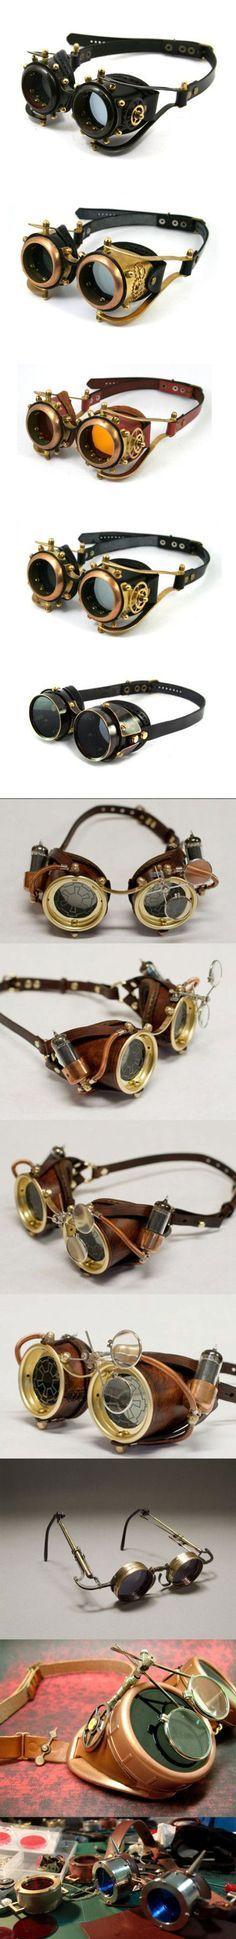 Cool steampunk eyewear